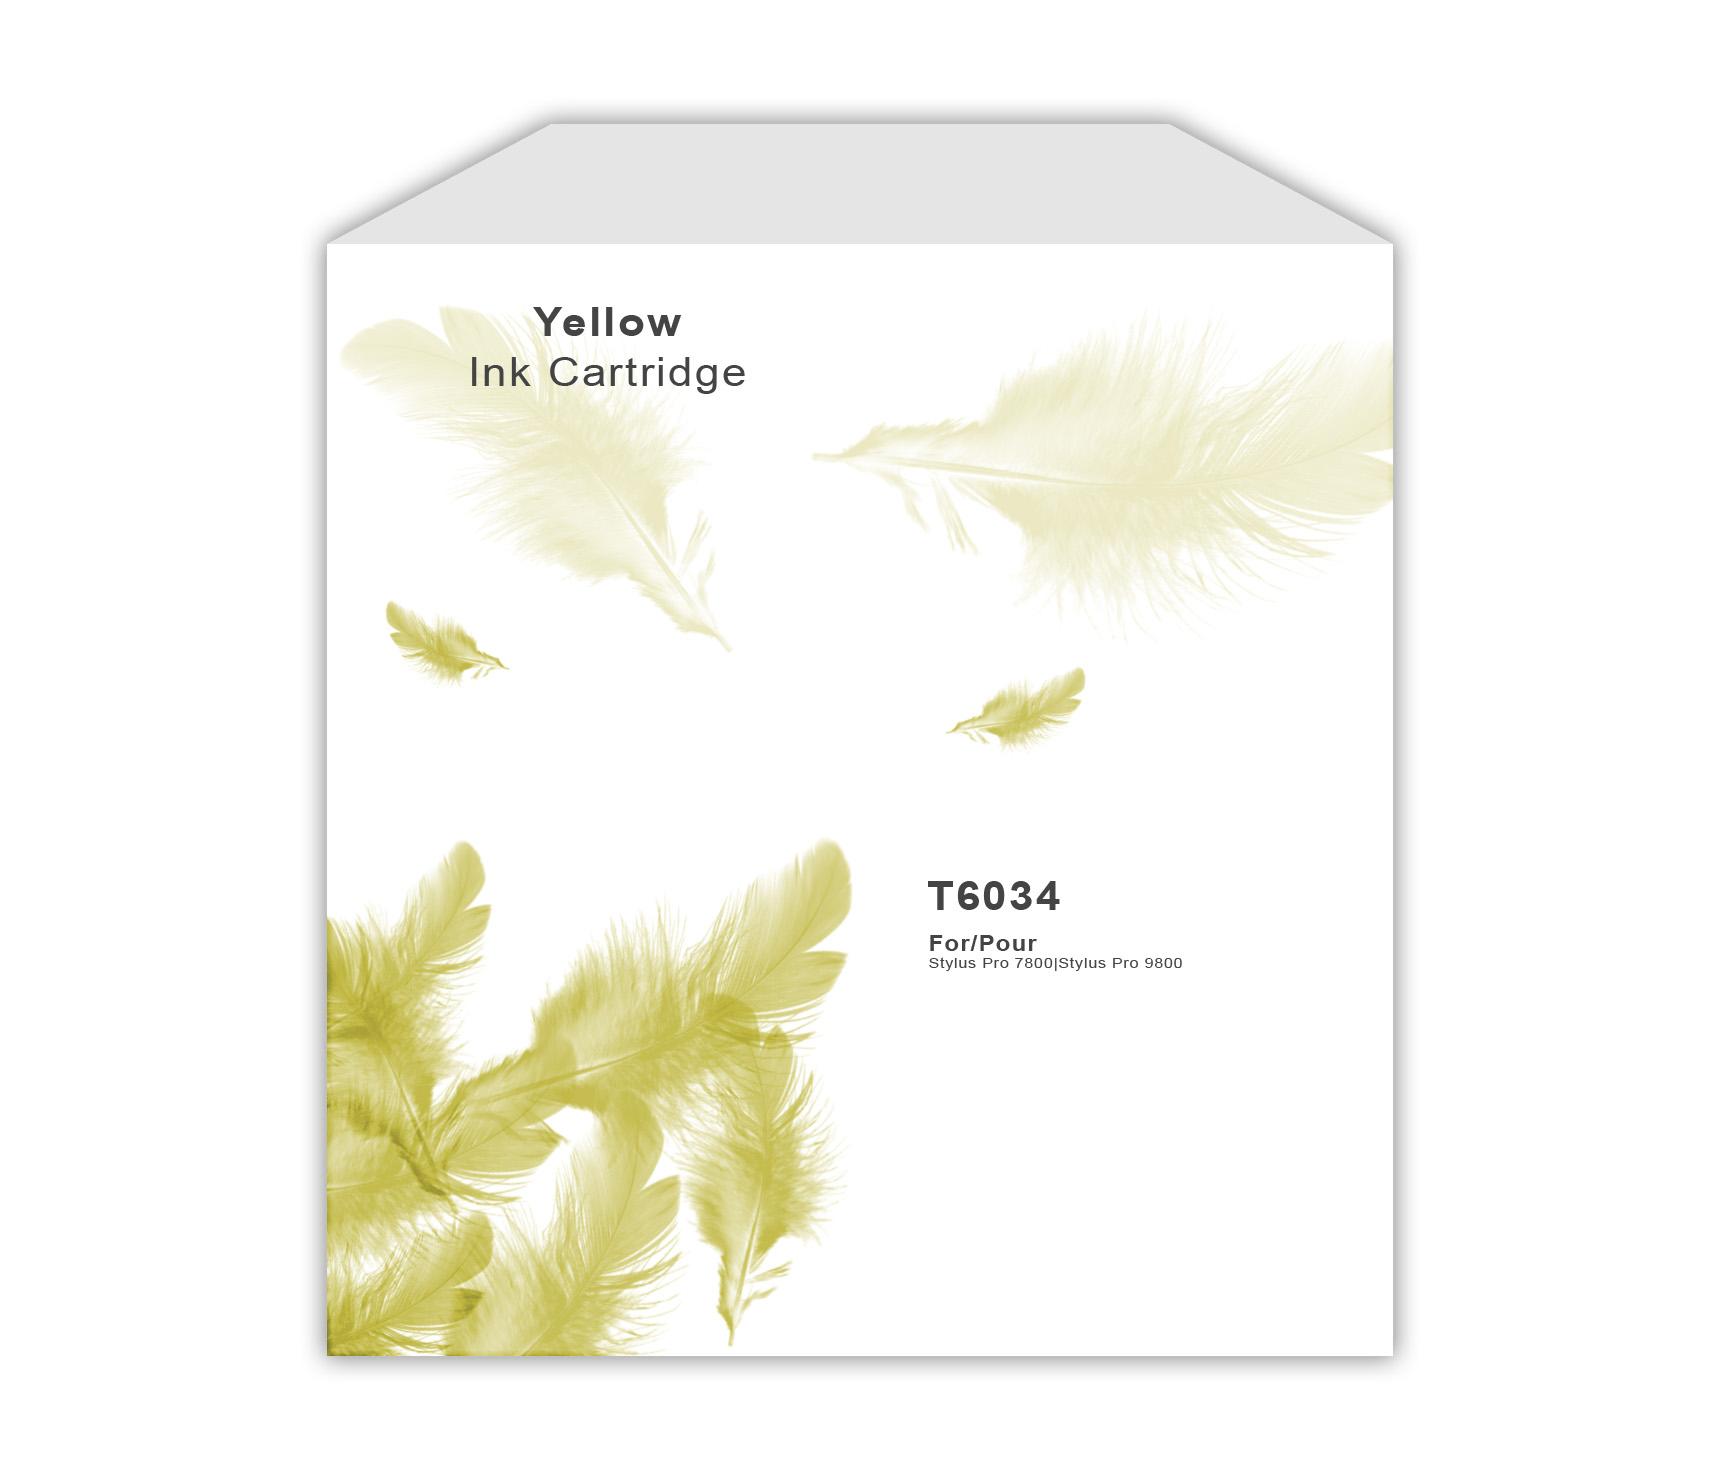 Epson T5634/T6034 Yellow Ink Cartridge